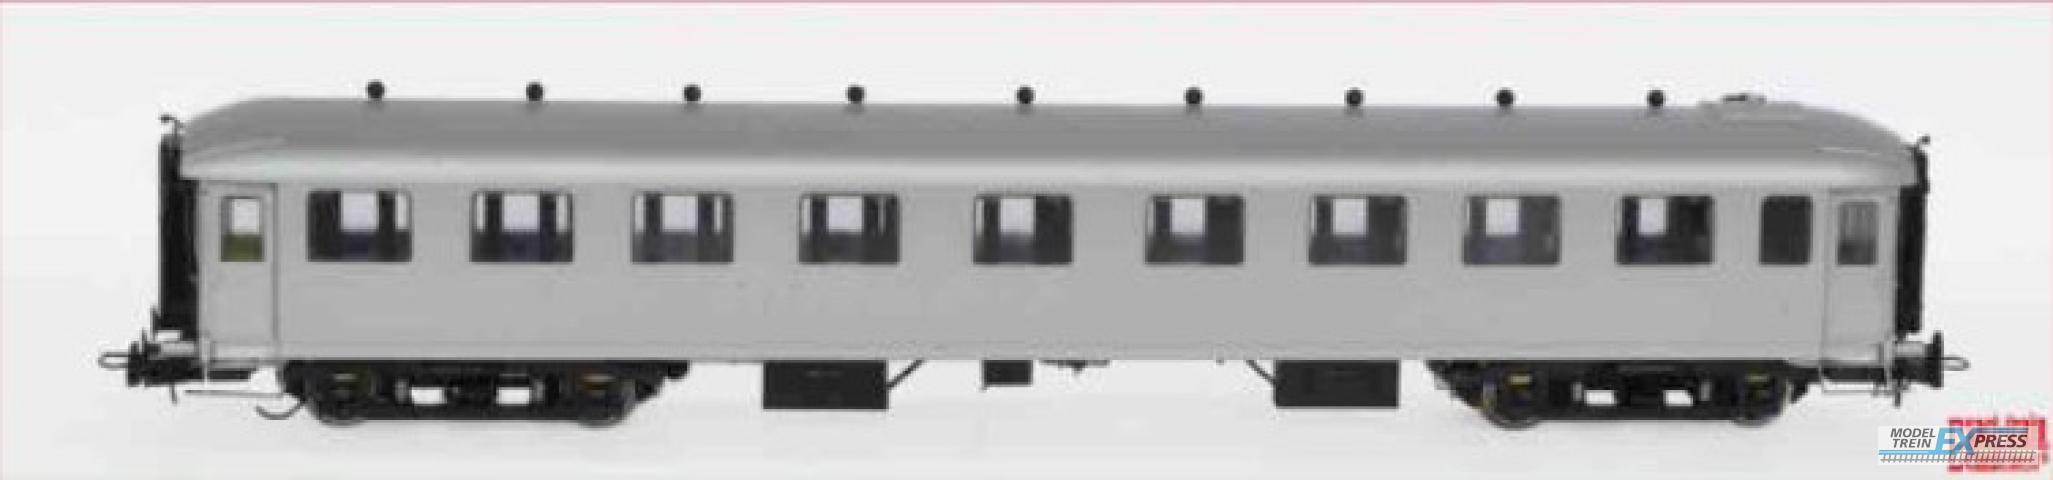 Exact-train 10032